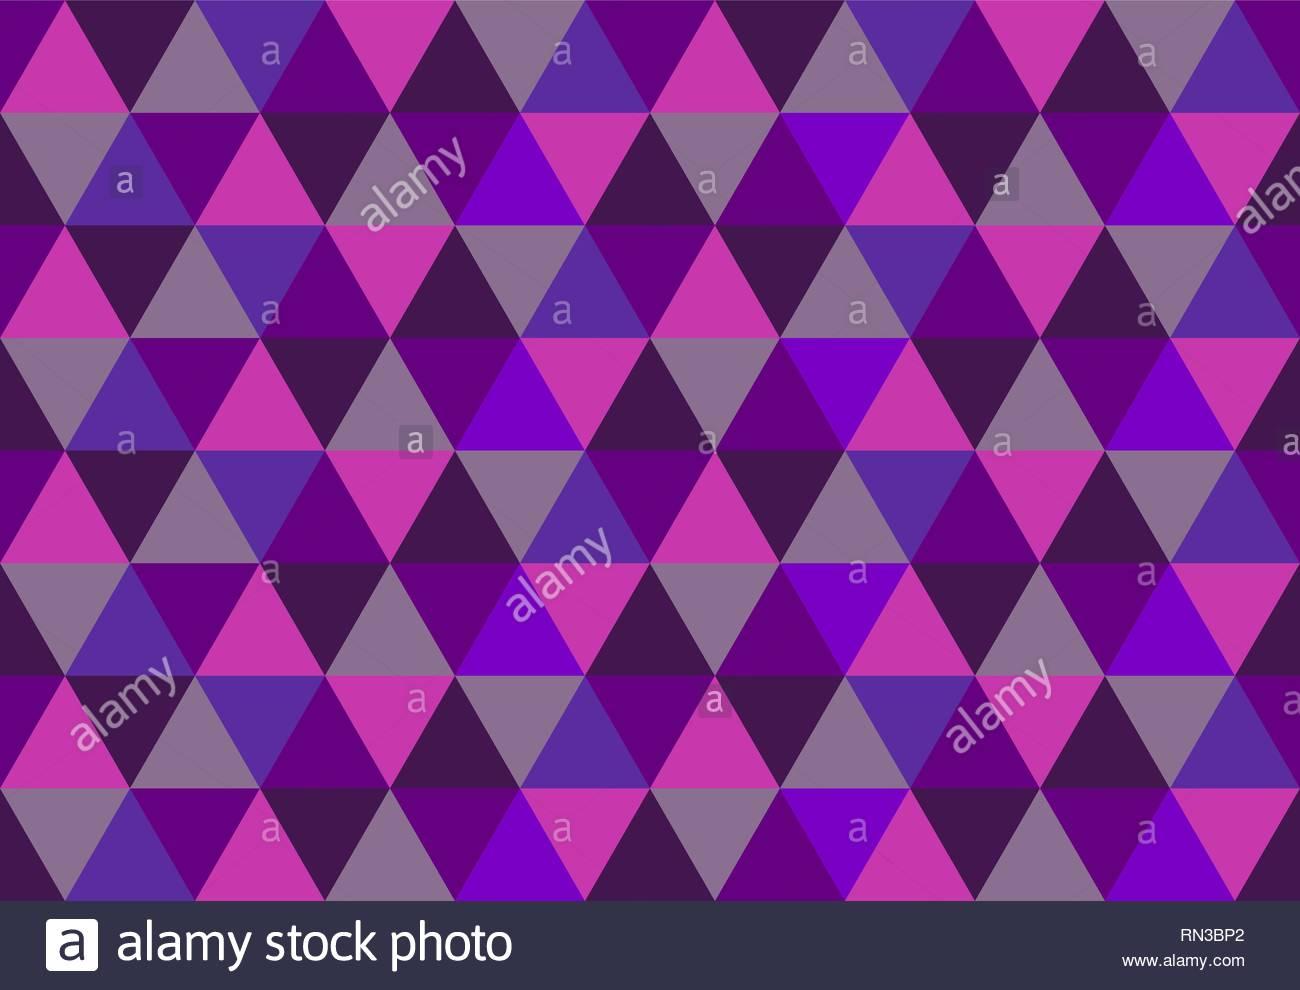 Triangular seamless patternLow poly geometric background Pink 1300x990